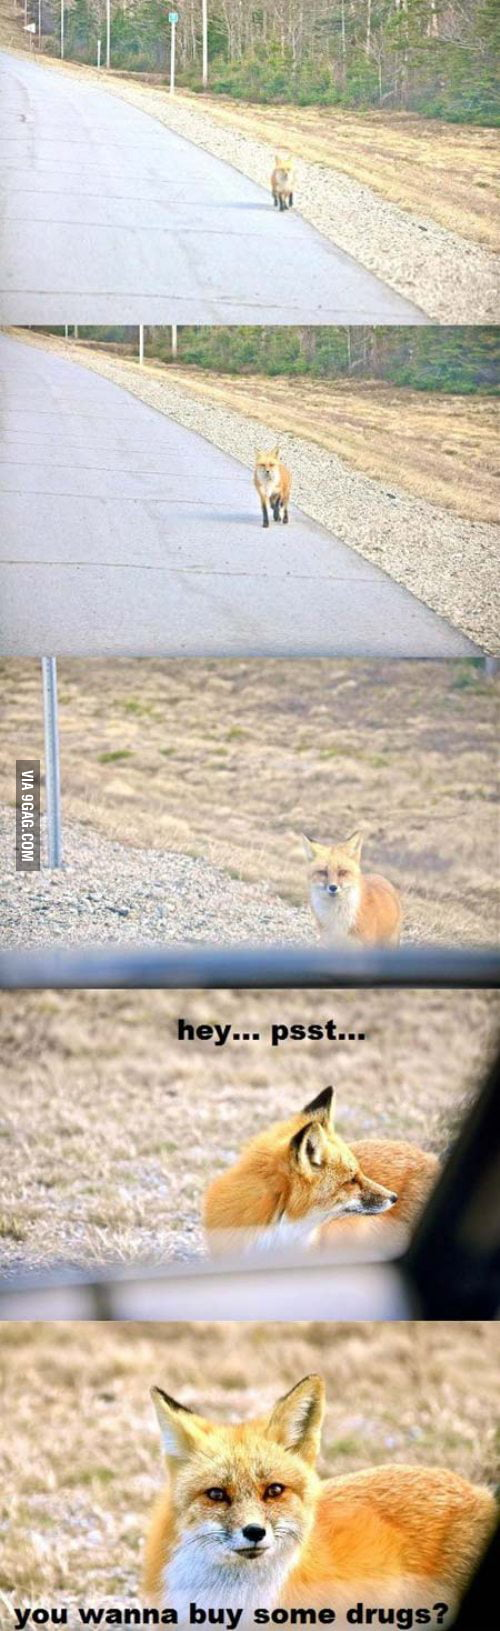 Hey...psst